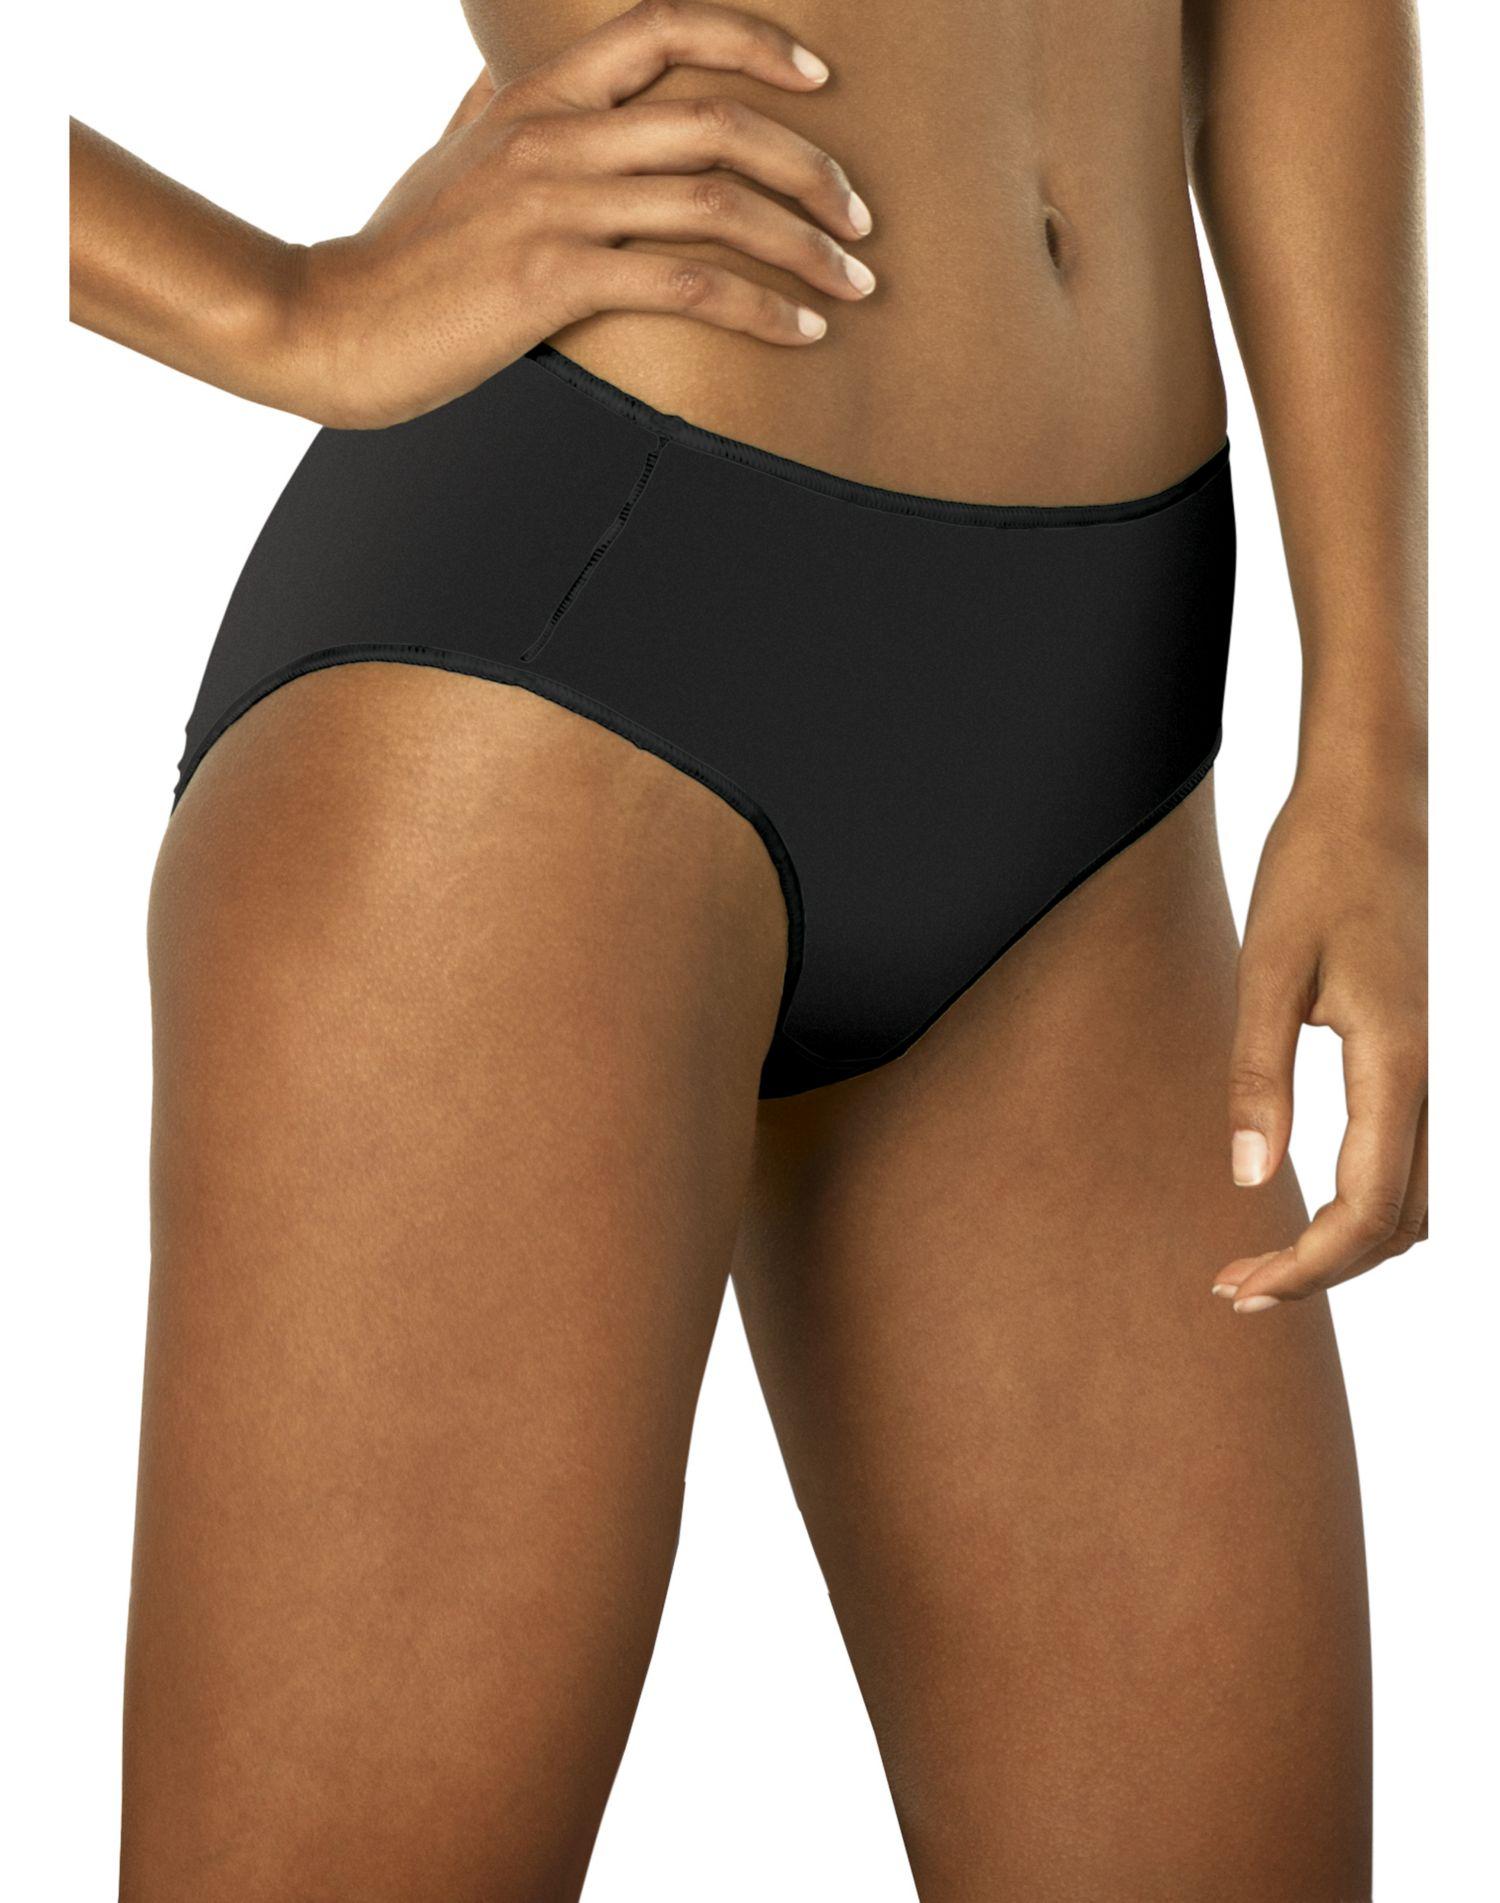 Hanes womens body creations microfiber bikini